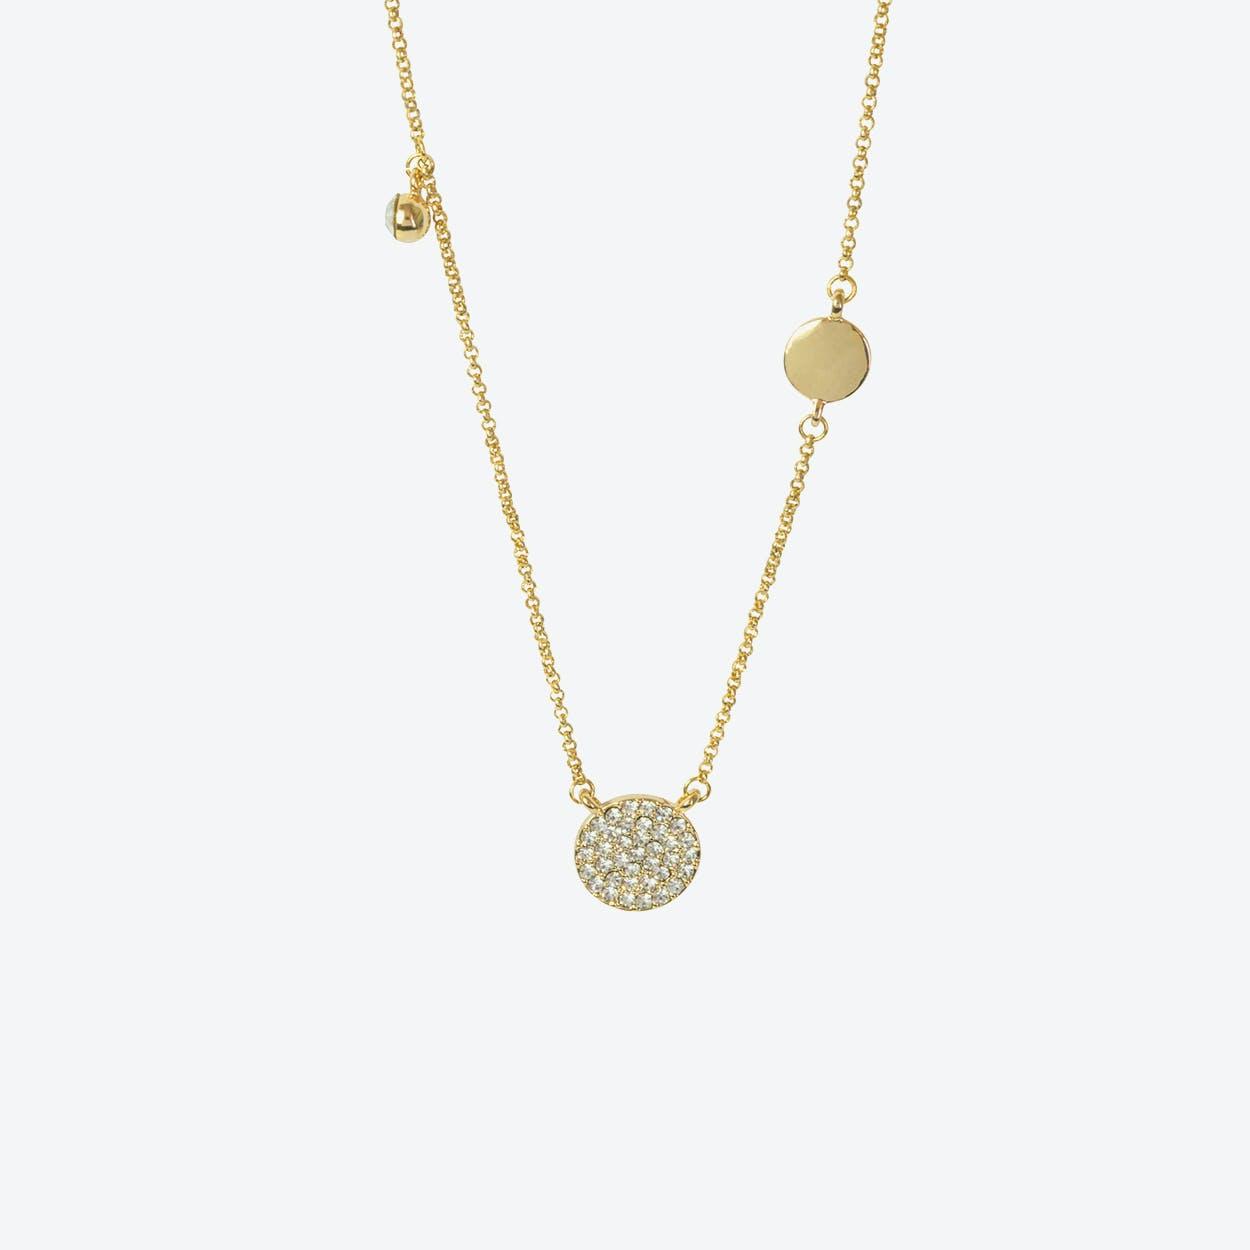 18k Gold Pave Disc Asymmetric Necklace